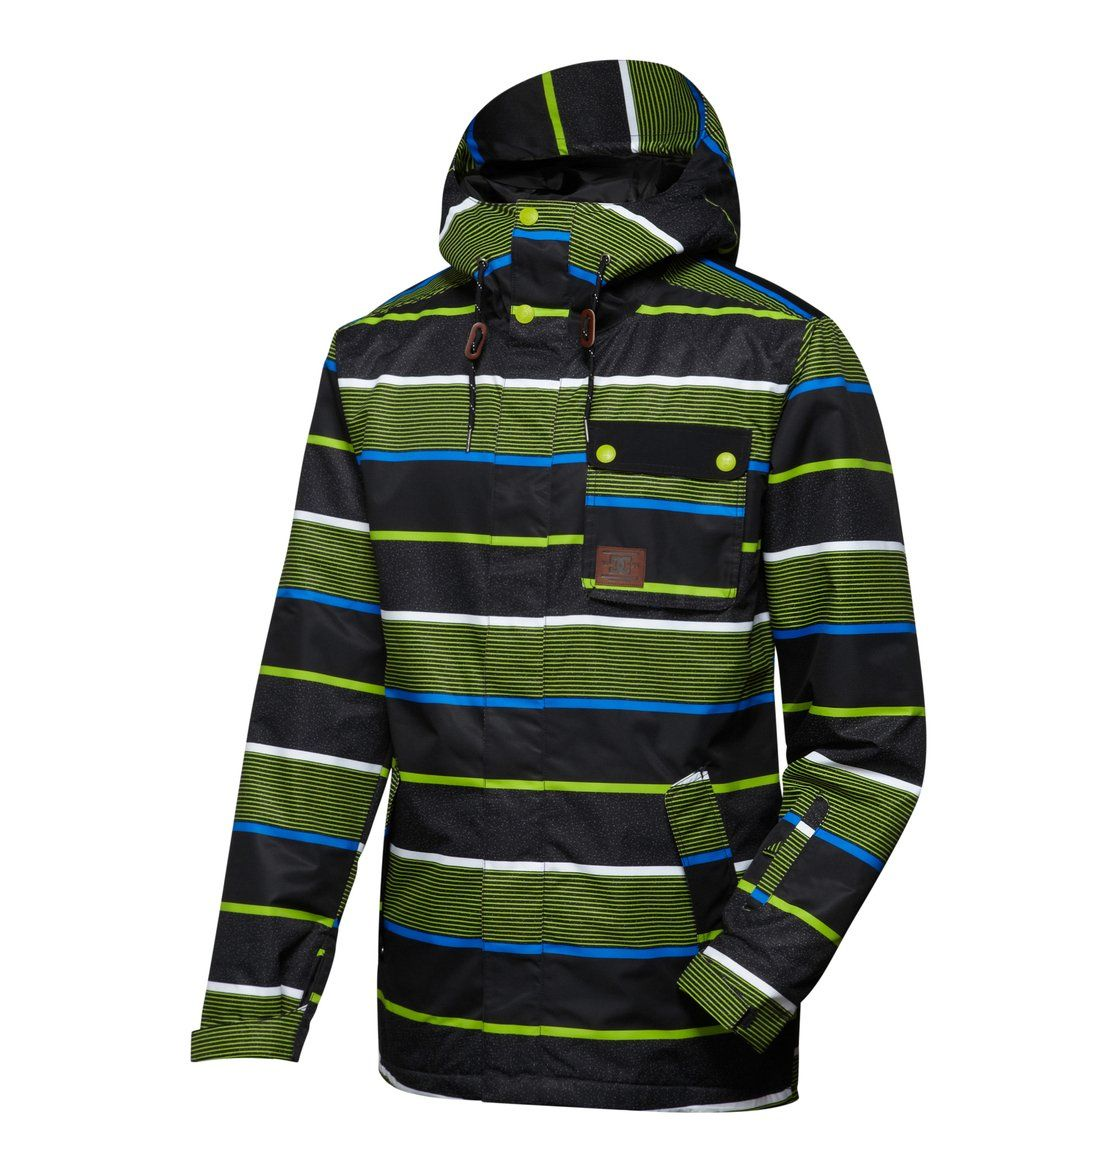 Men S Reality Snow Jacket Snow Jacket Jackets Mens Outfits